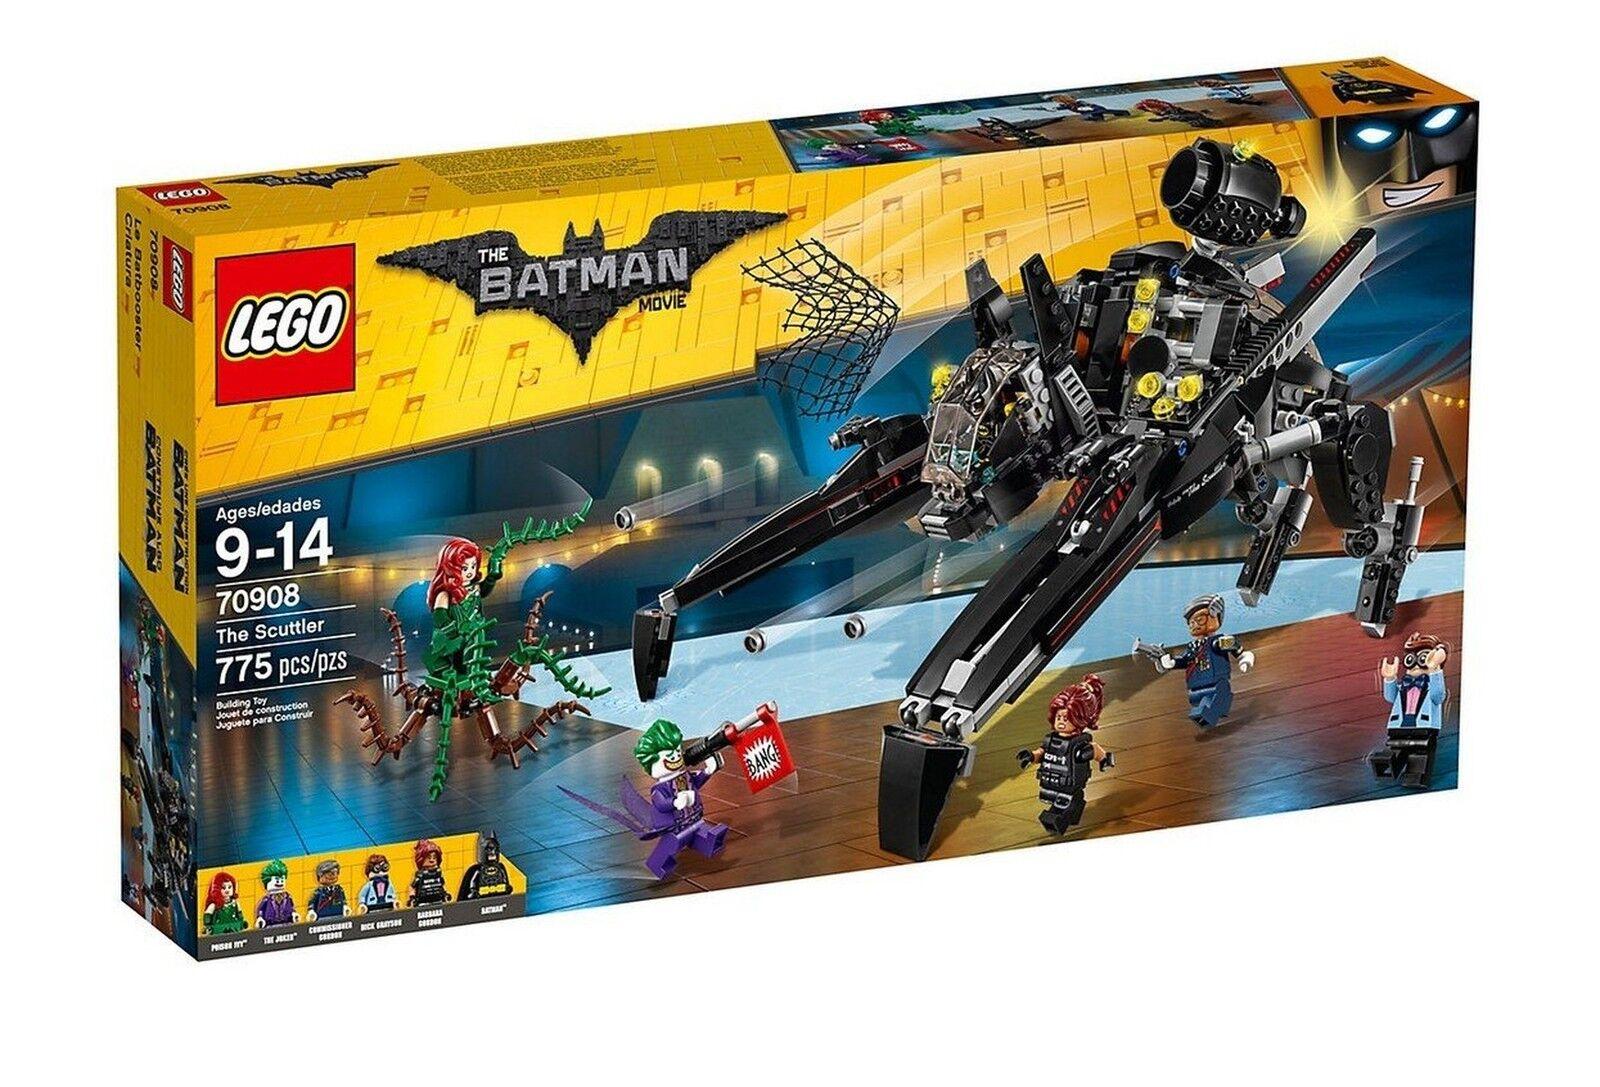 LEGO Batman The Scuttler 70908